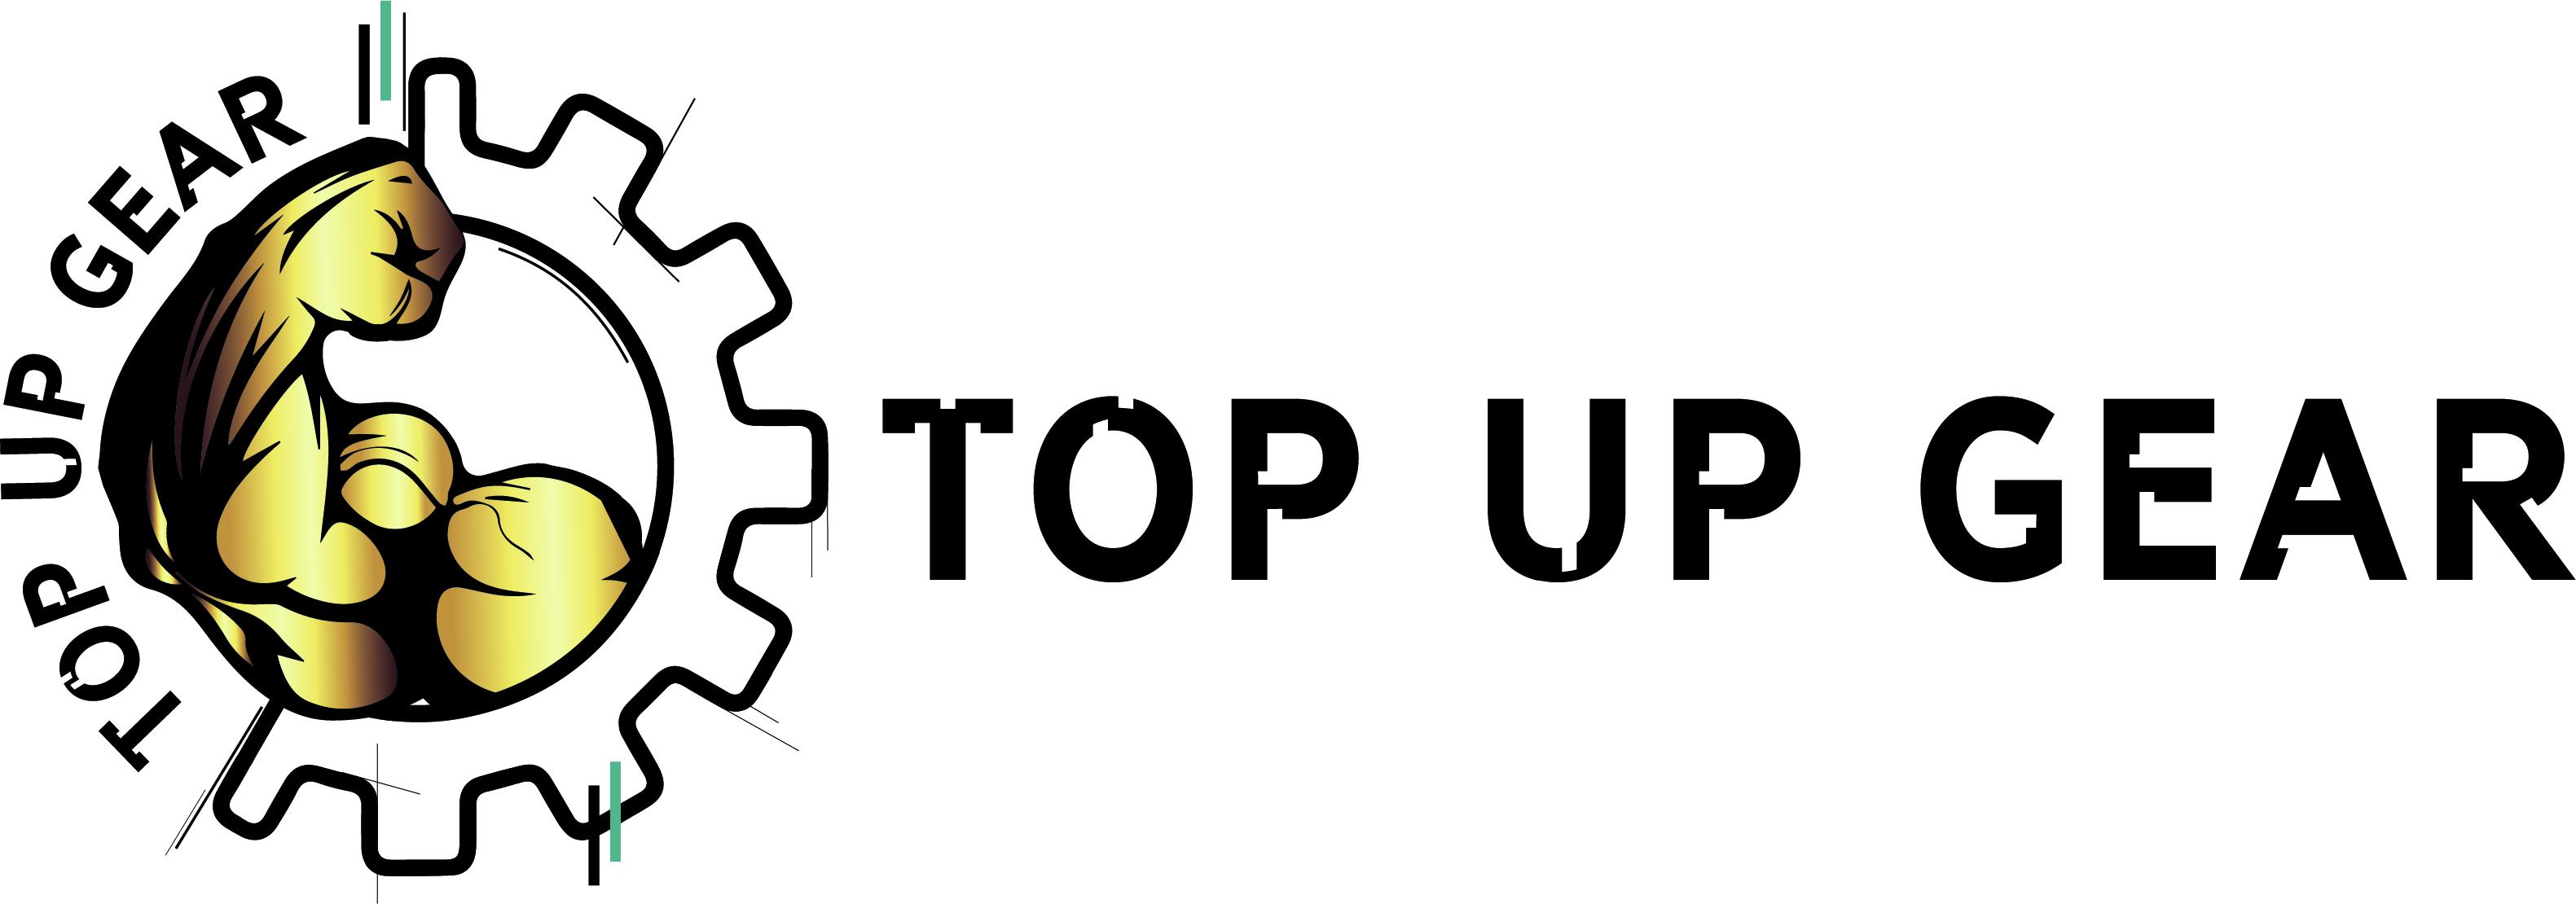 (TUG) beeldmerk 2.jpg